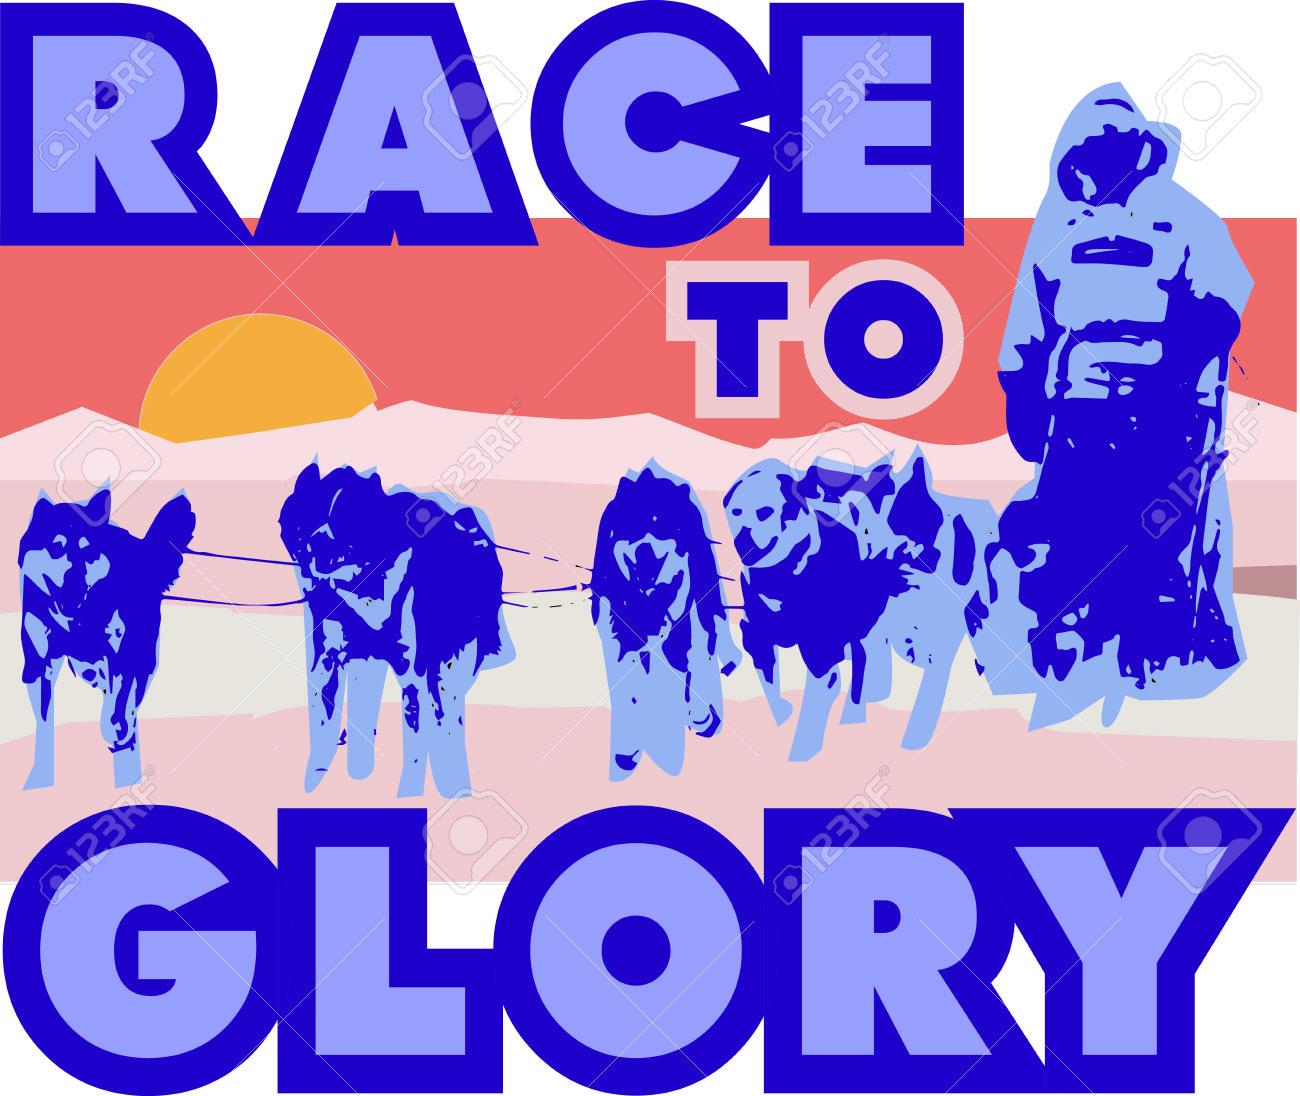 The Iditarod Trail Is The World's Longest Winter Ultra Marathon.